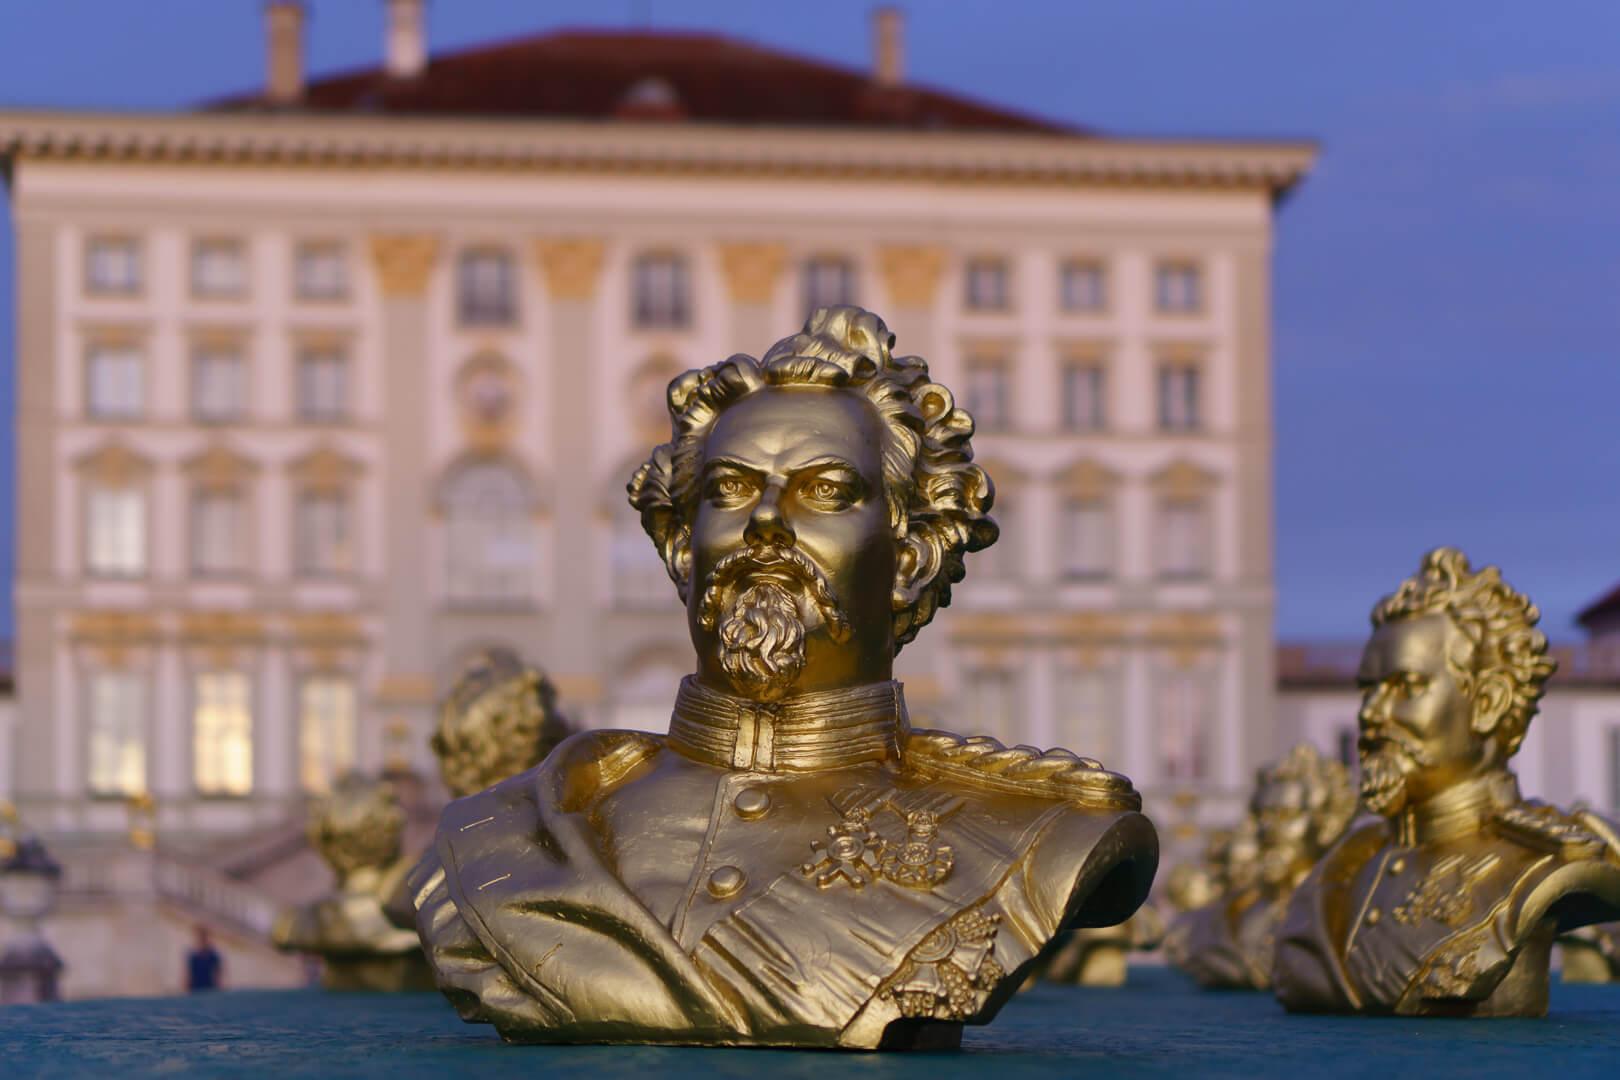 Kunstinstallation zu König Ludwig II (1/500- f/1,8 - 35mm - ISO400)